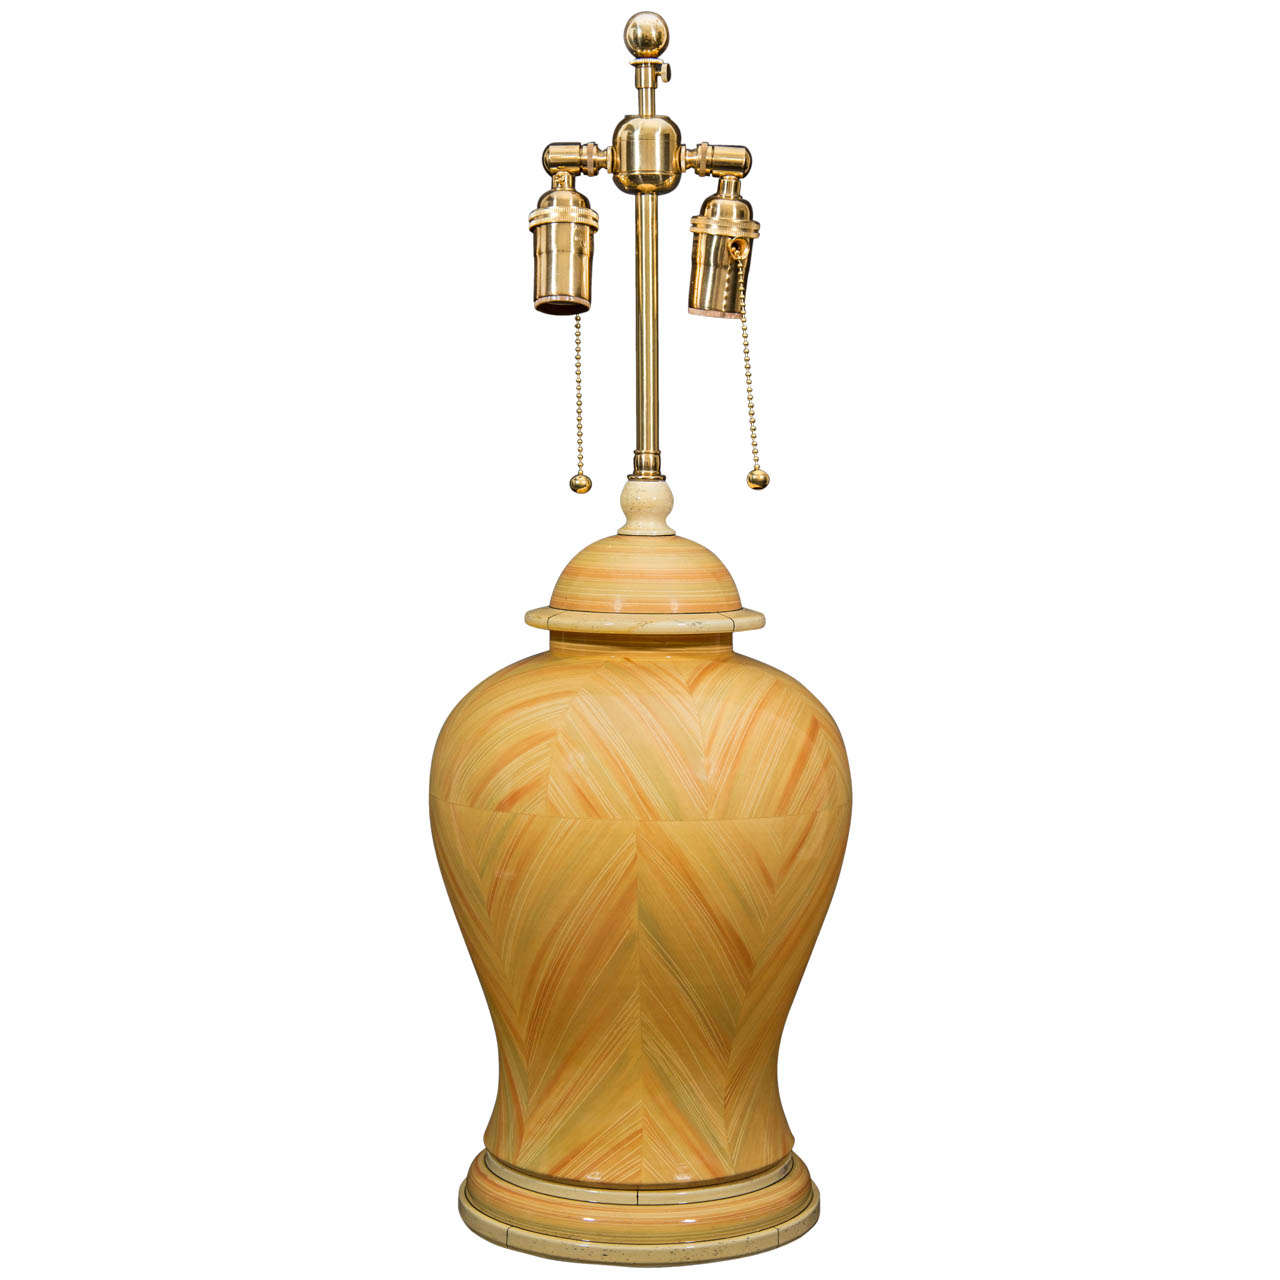 Ceramic Ginger Jar Shaped Lamp At 1stdibs